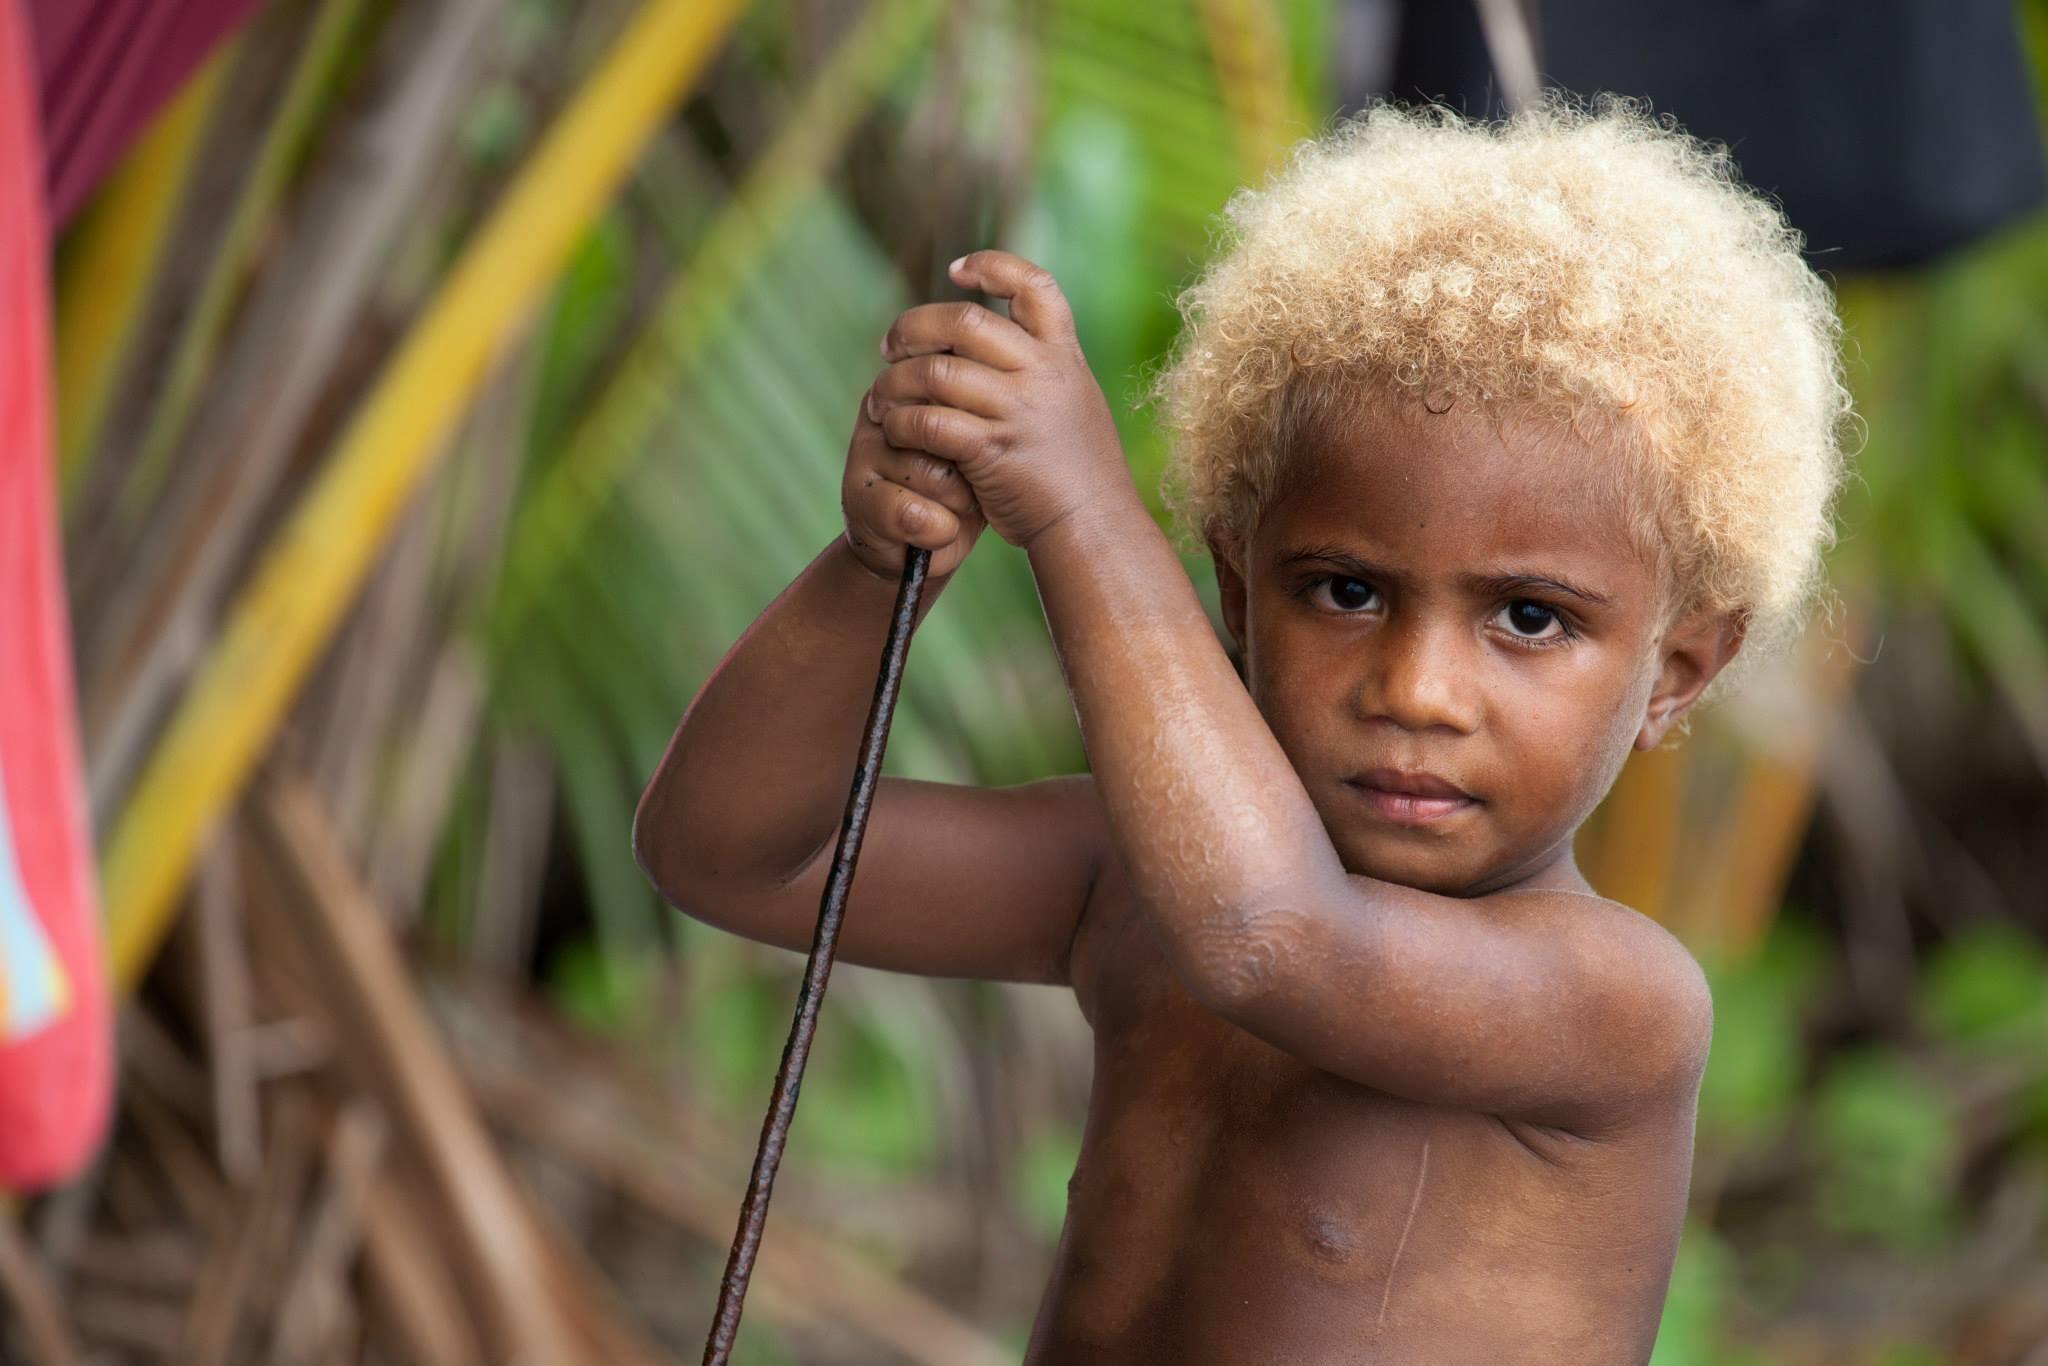 Kanak (Melanesian) girl on the beach at Mebuet, island of